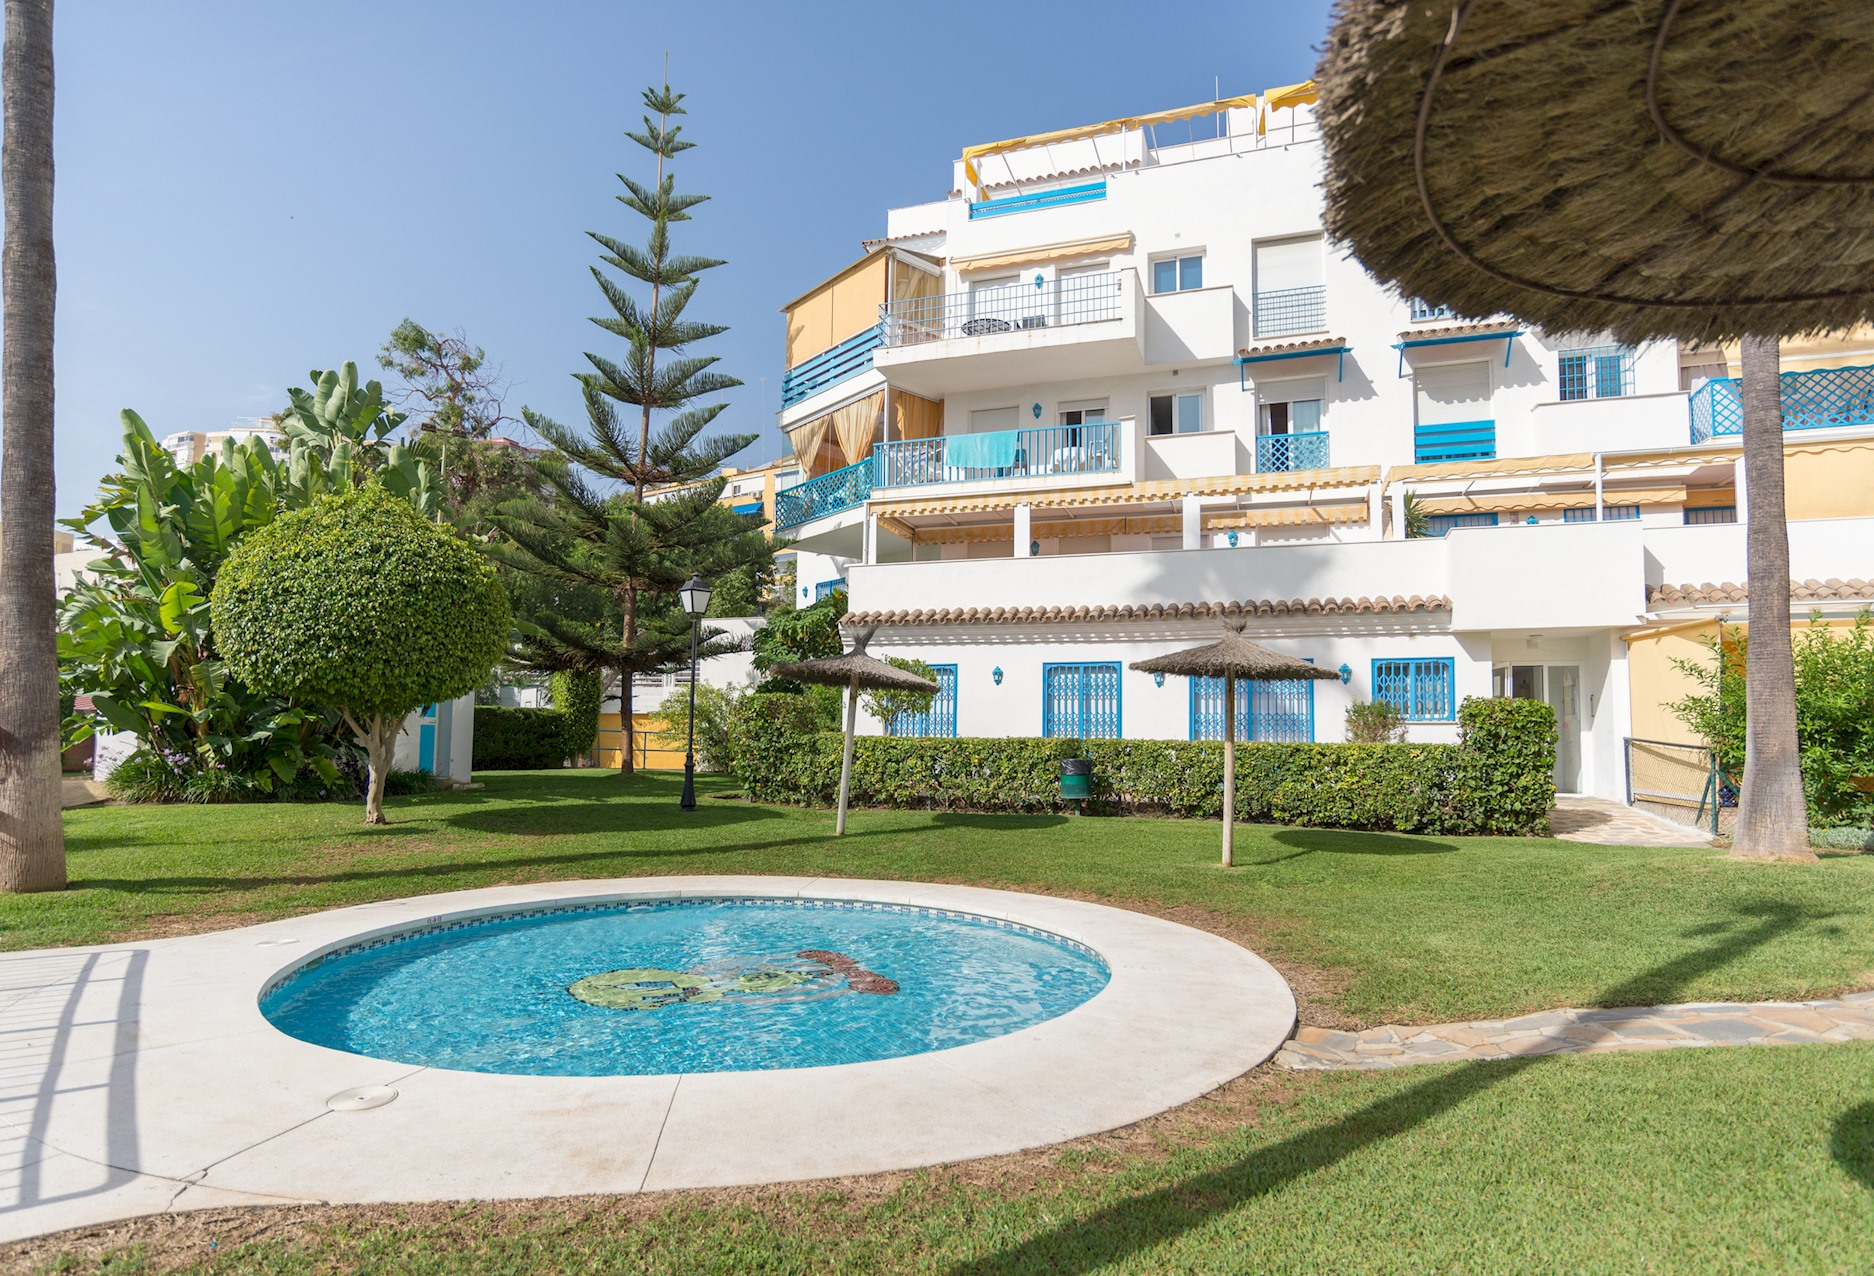 Apartment MalagaSuite Lux Beach   Pool photo 20147421